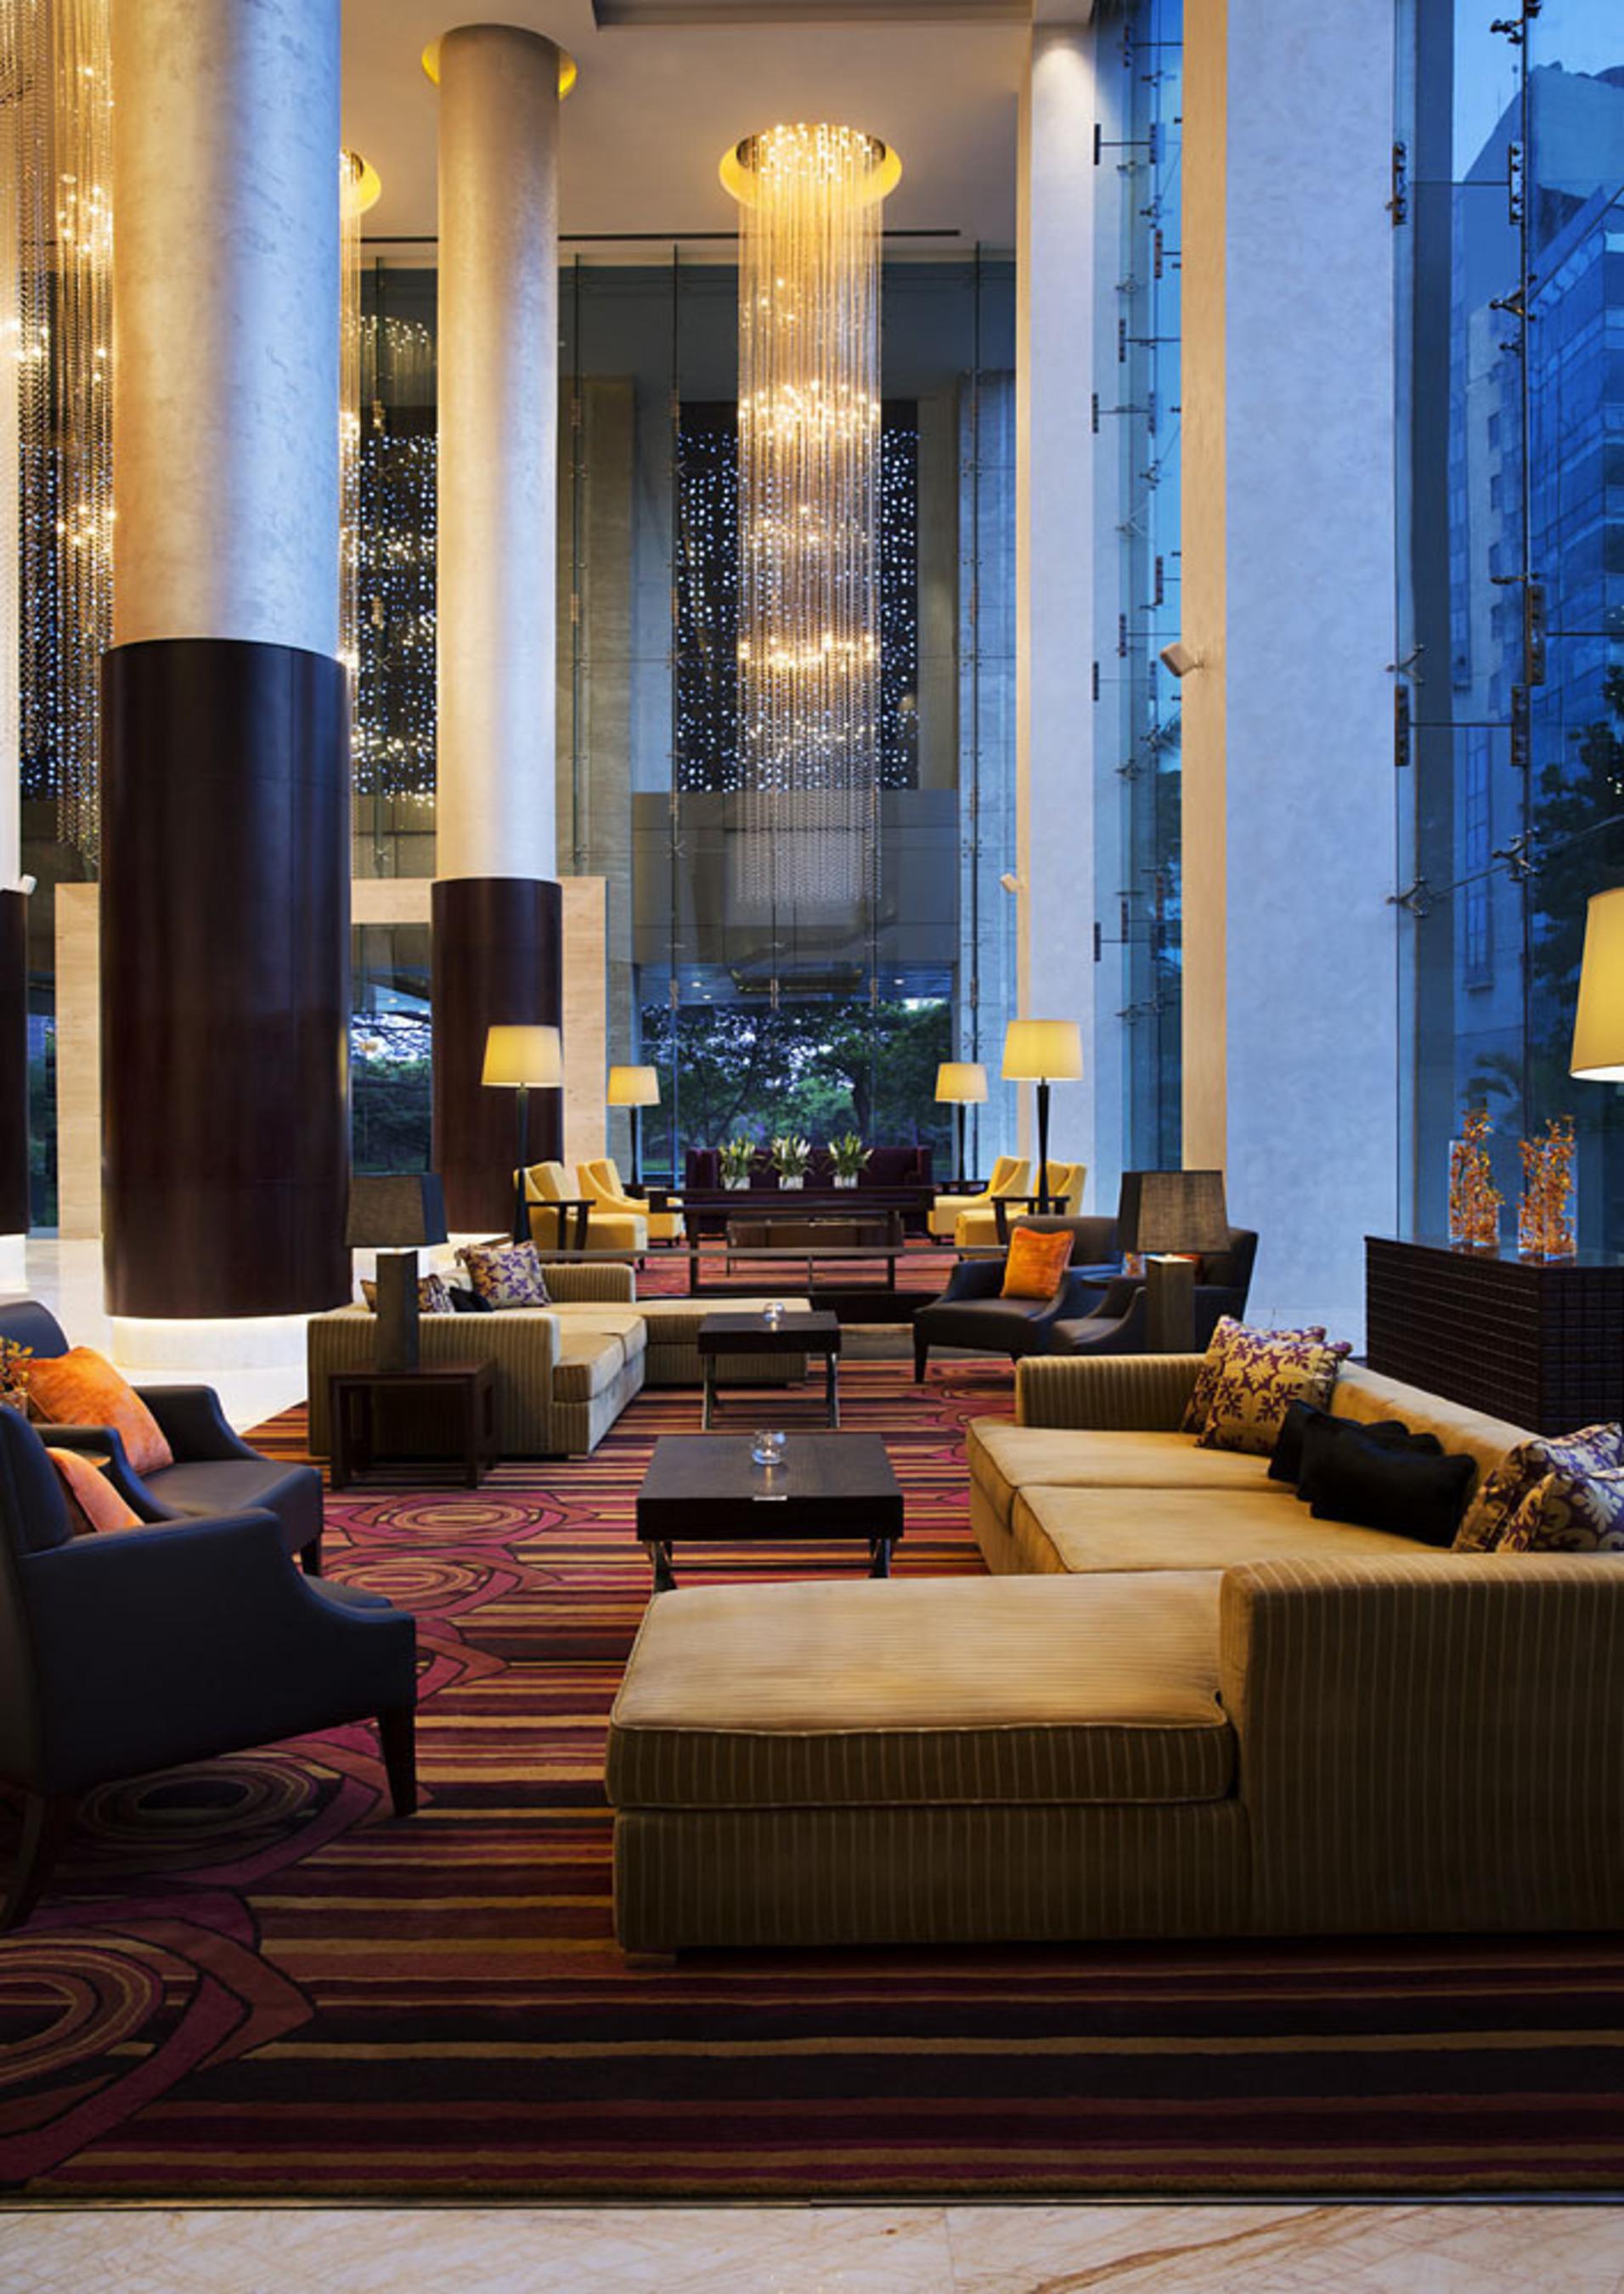 JW Marriott Brand Debuts Two New India Properties Weeks Apart; Global Luxury Hospitality Brand Welcomes Bengaluru (pictured) and New Delhi Hotels to Growing India Portfolio.  (PRNewsFoto/Marriott International, Inc.)